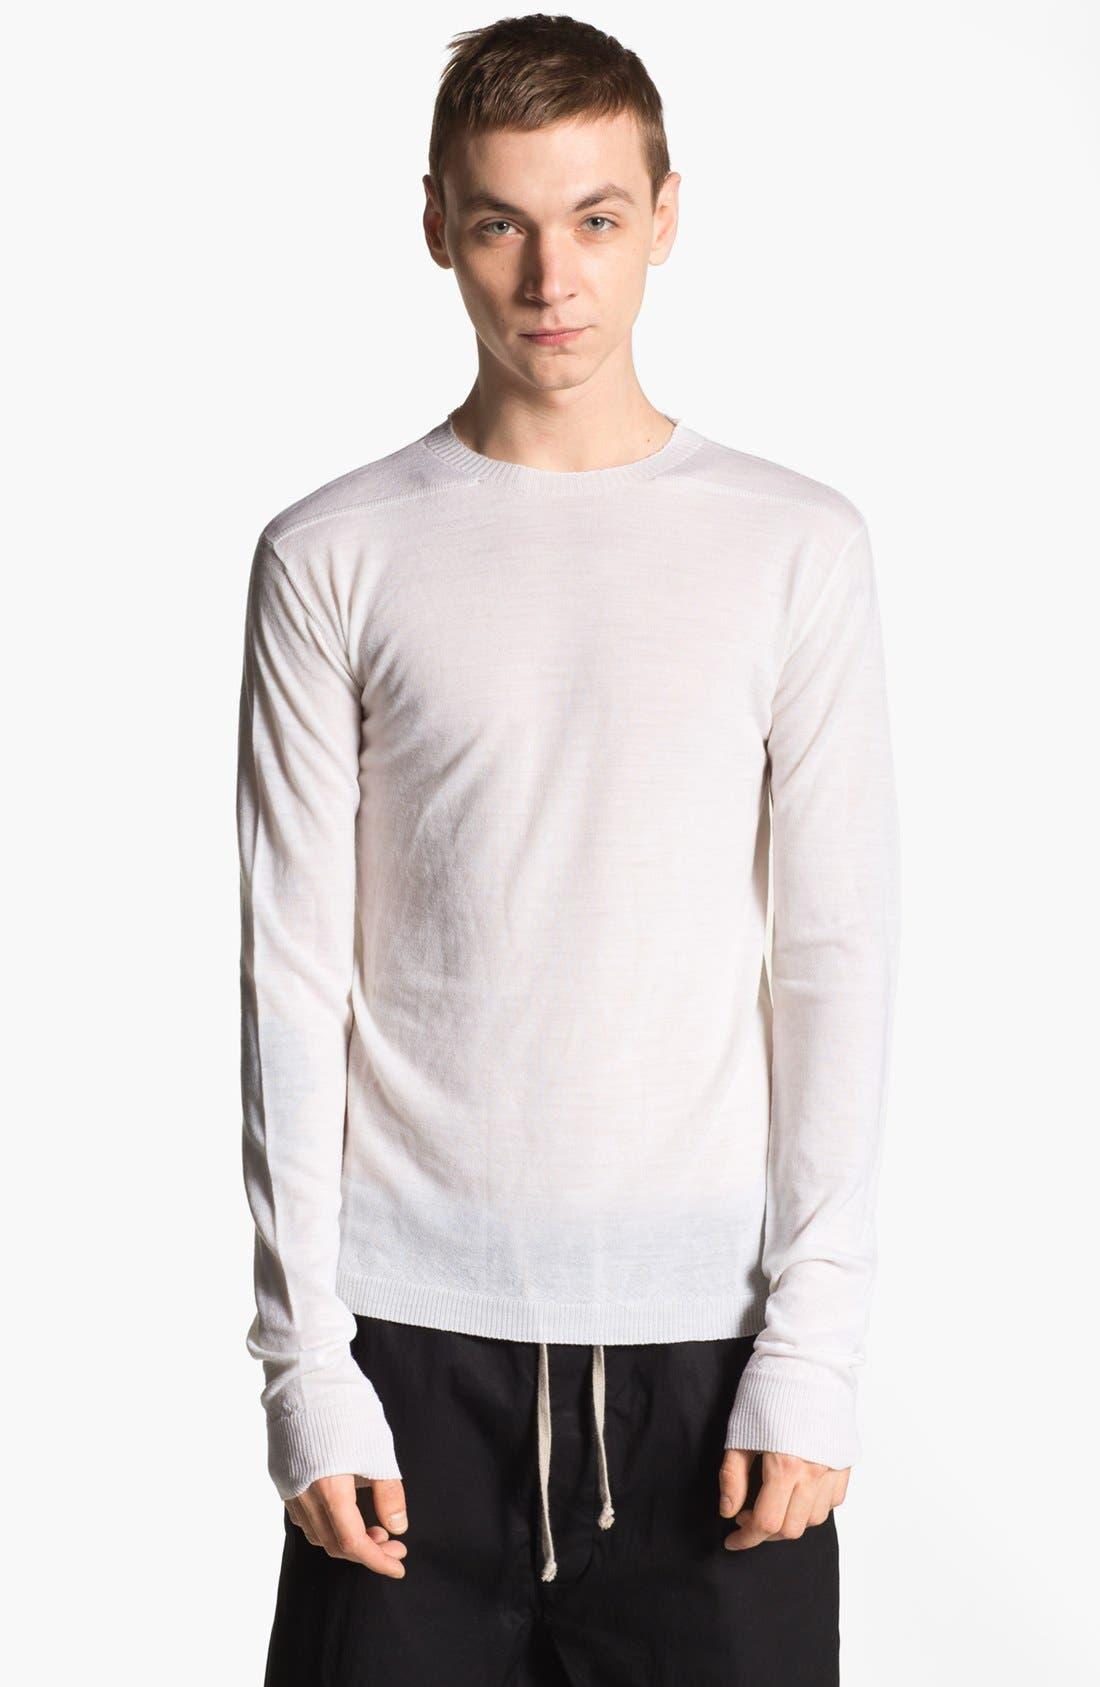 Alternate Image 1 Selected - Rick Owens 'Island' Crewneck Merino Wool Sweater